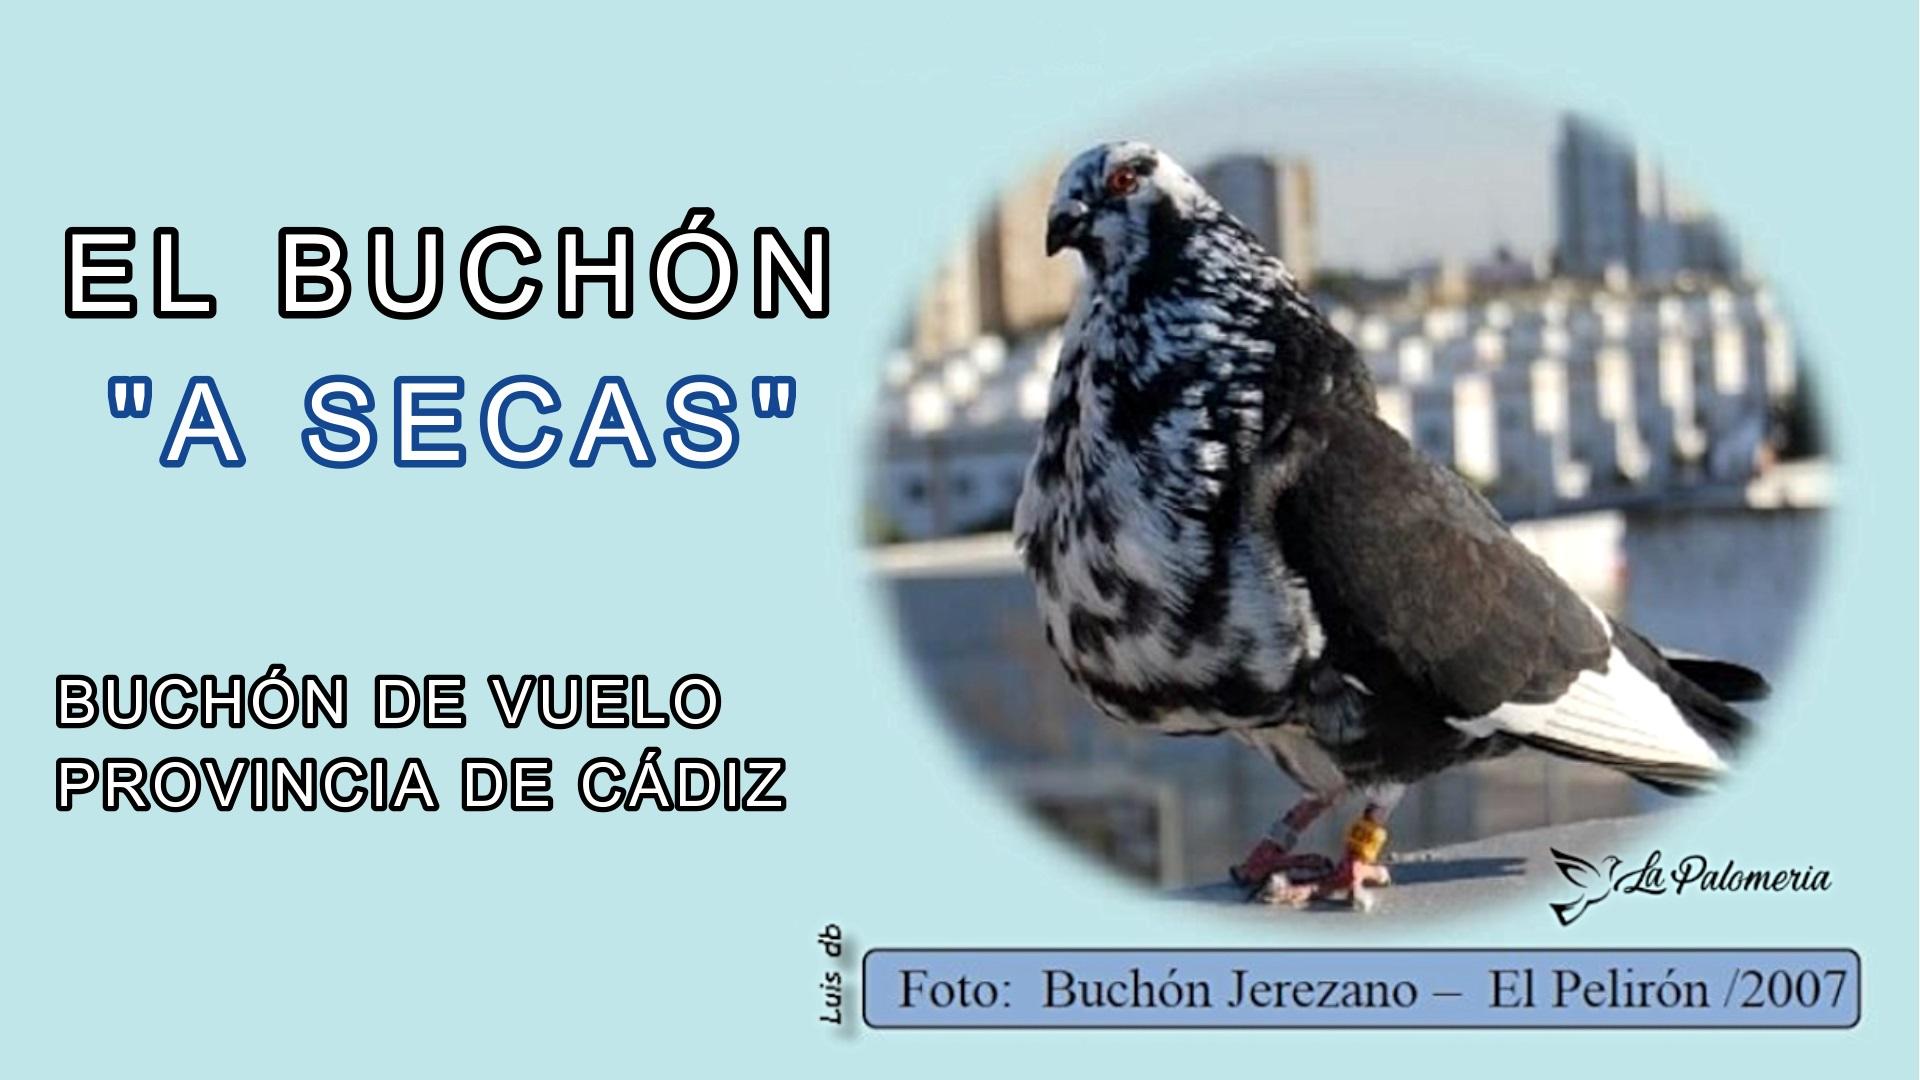 lapalomeria-buchon-secas